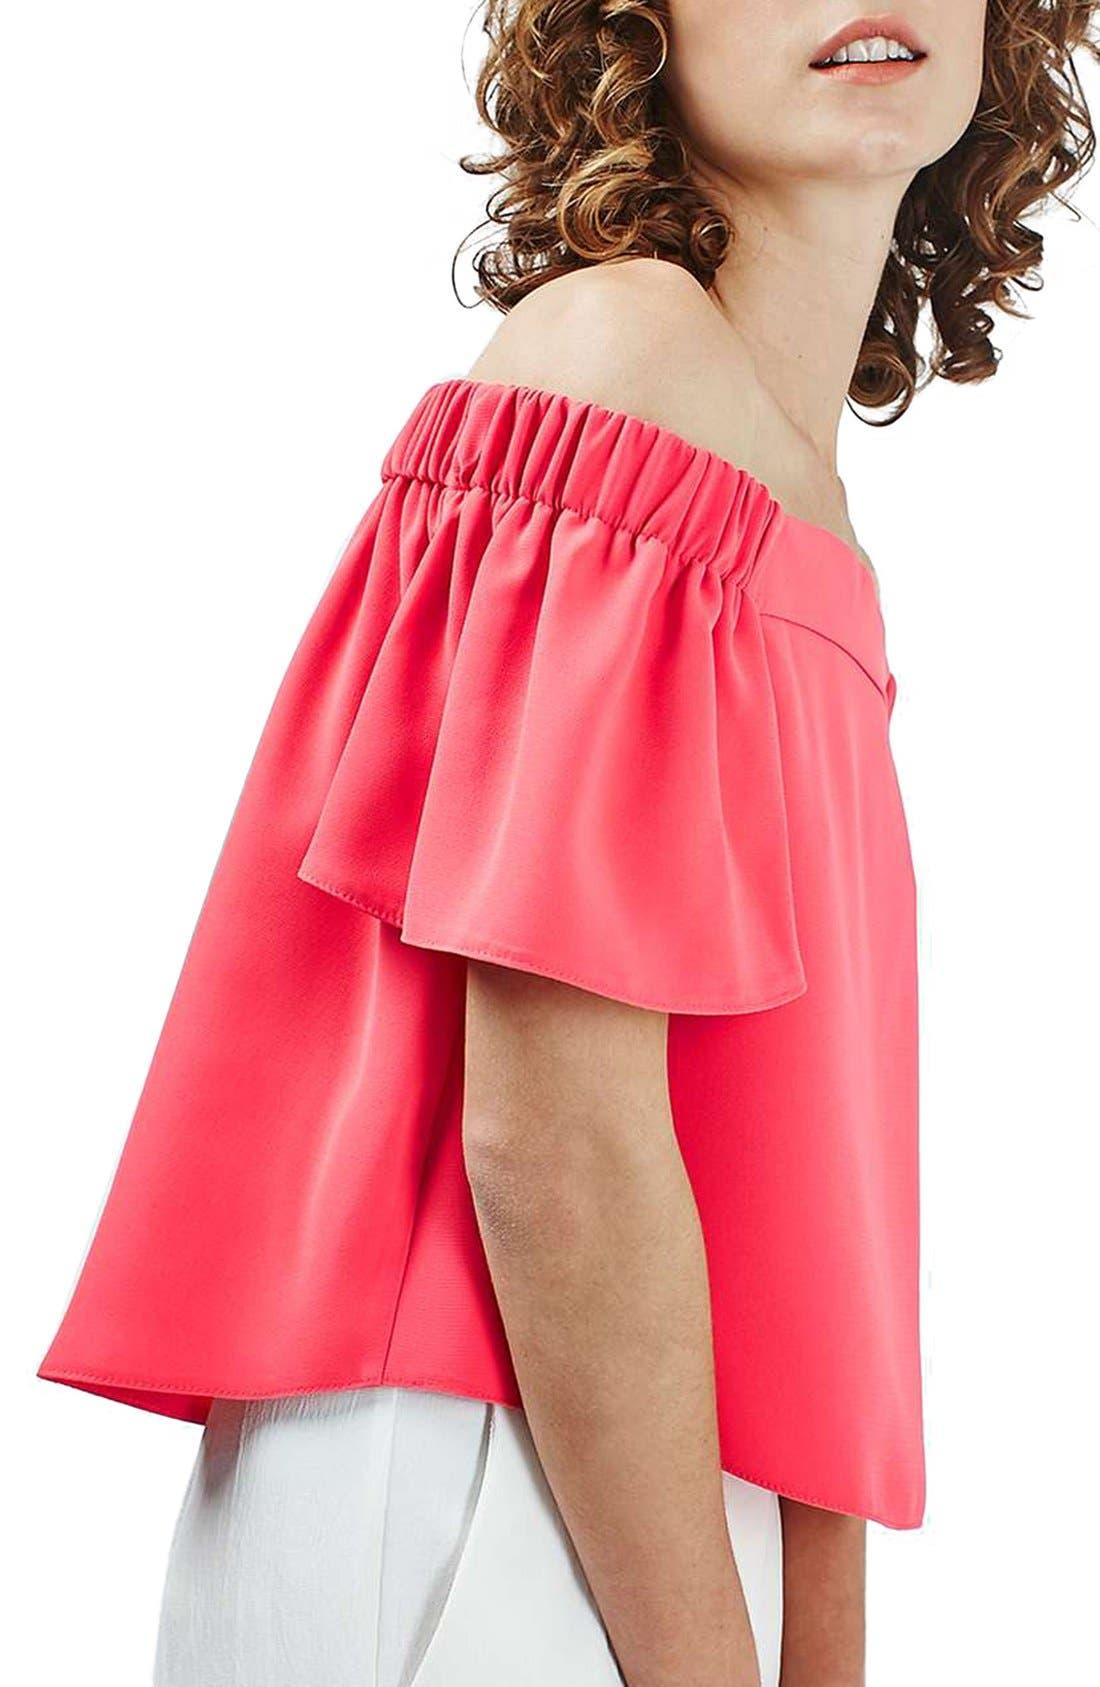 'Livi' Off the Shoulder Top,                         Main,                         color, Bright Pink